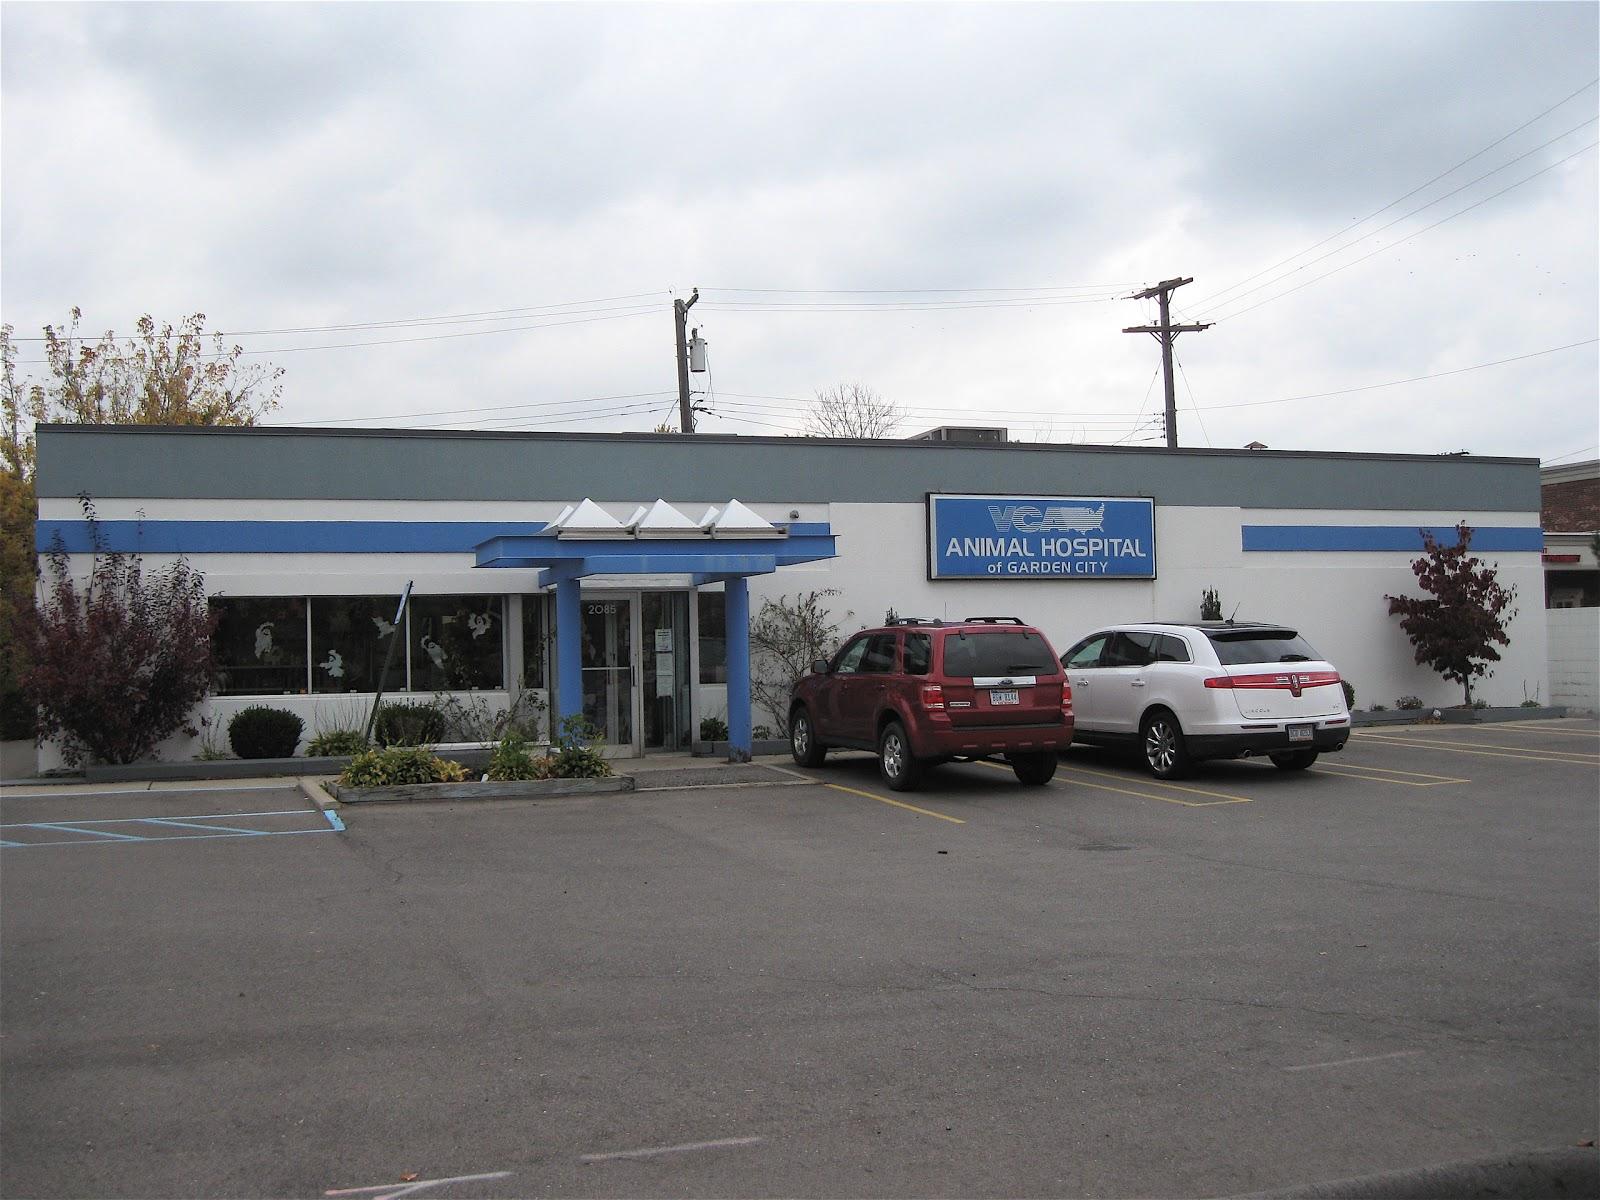 VCA Animal Hospital of Garden City, 2085 Inkster Road